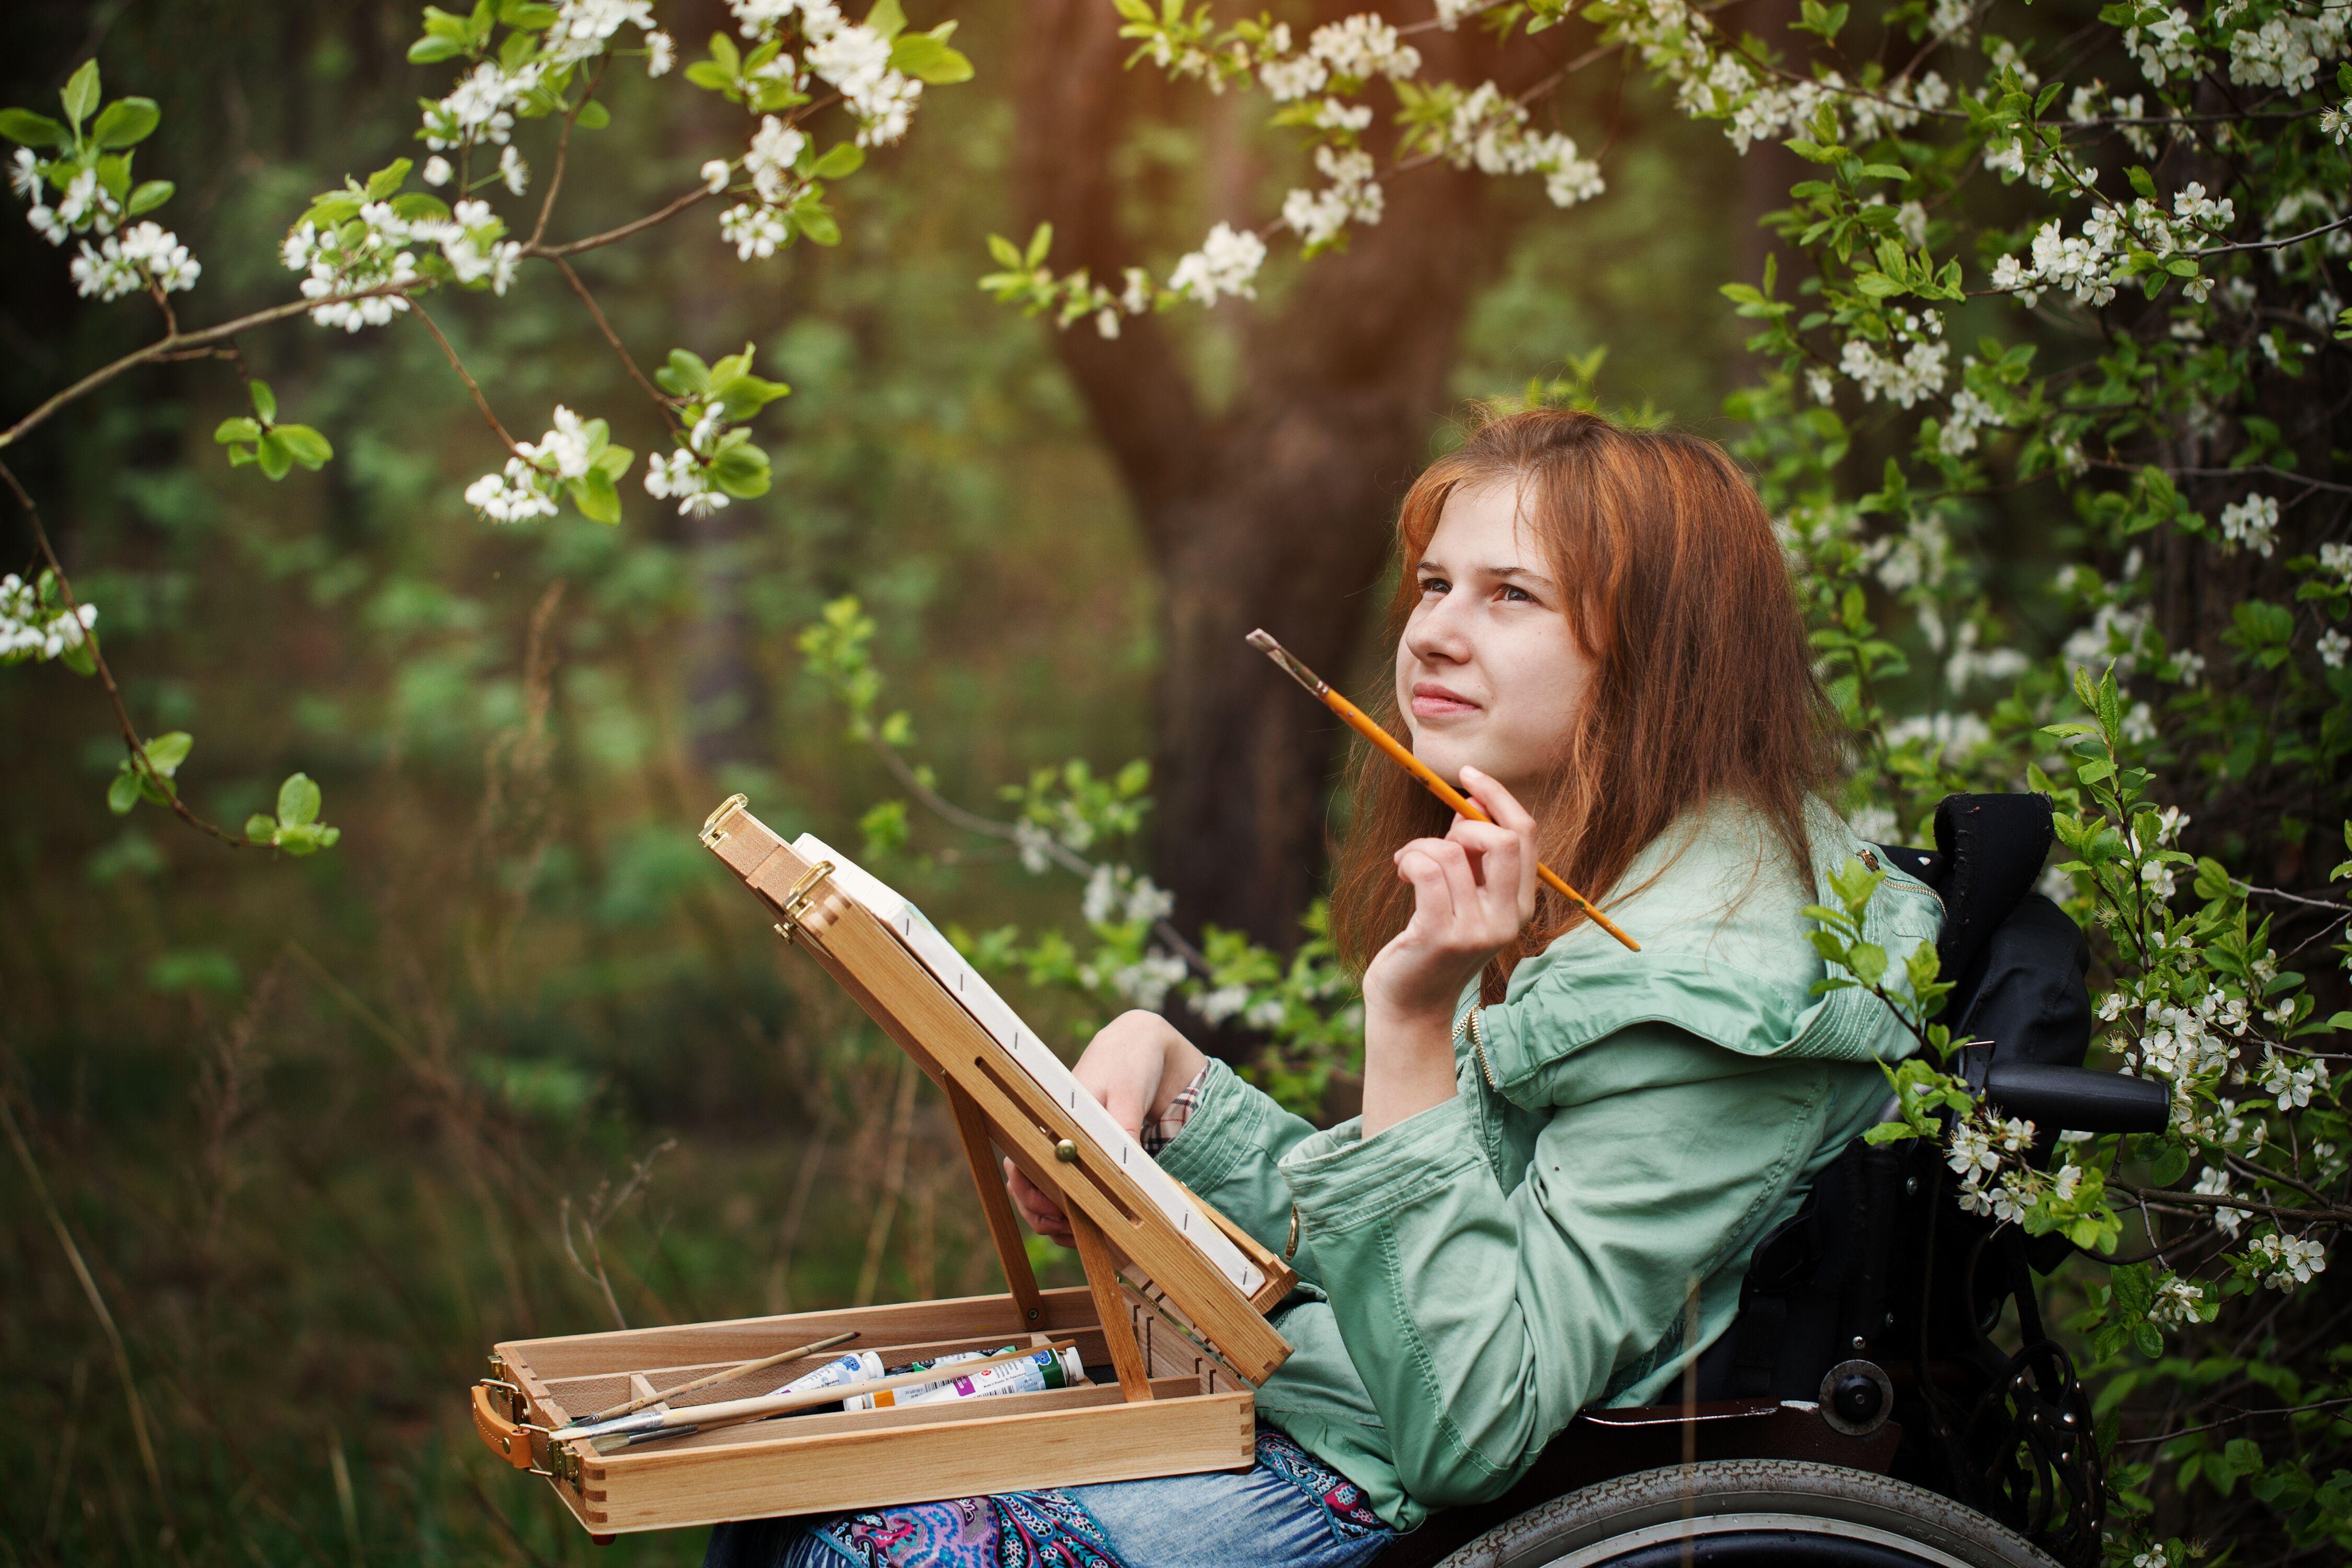 Stroke survivor painting